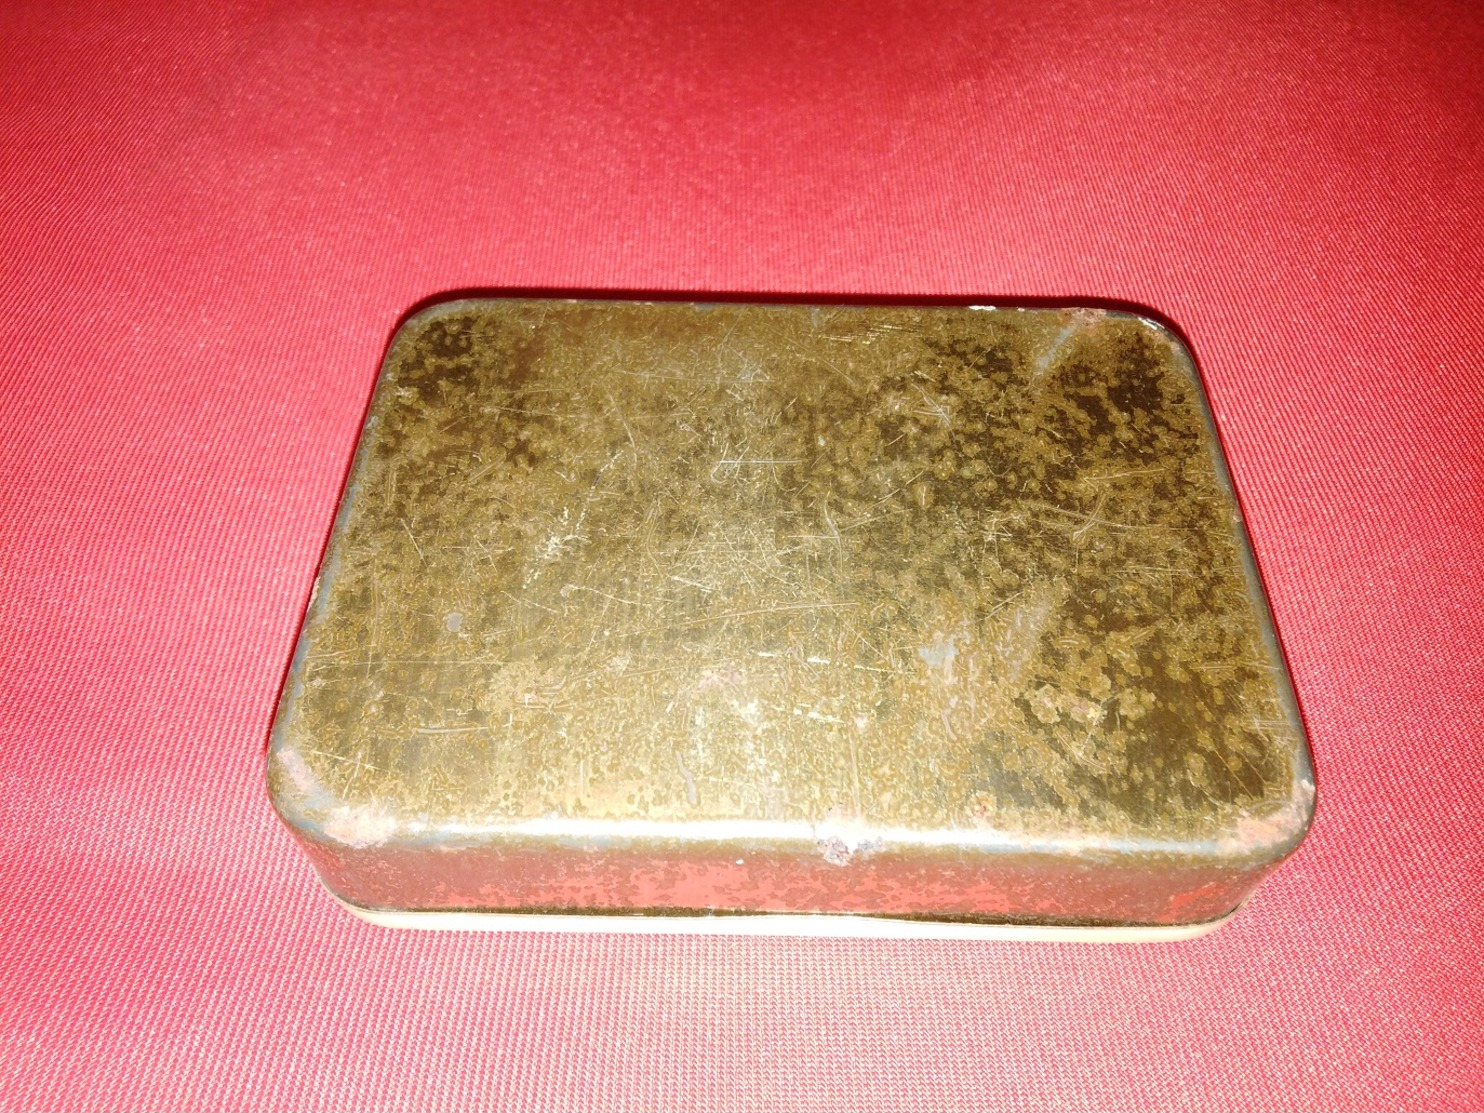 NEEHS SHAG TABAKFABRIK JOSEPH NEEHS HITDORF OLD TIN BOX TOBACCO - RARE - Tabaksdozen (leeg)